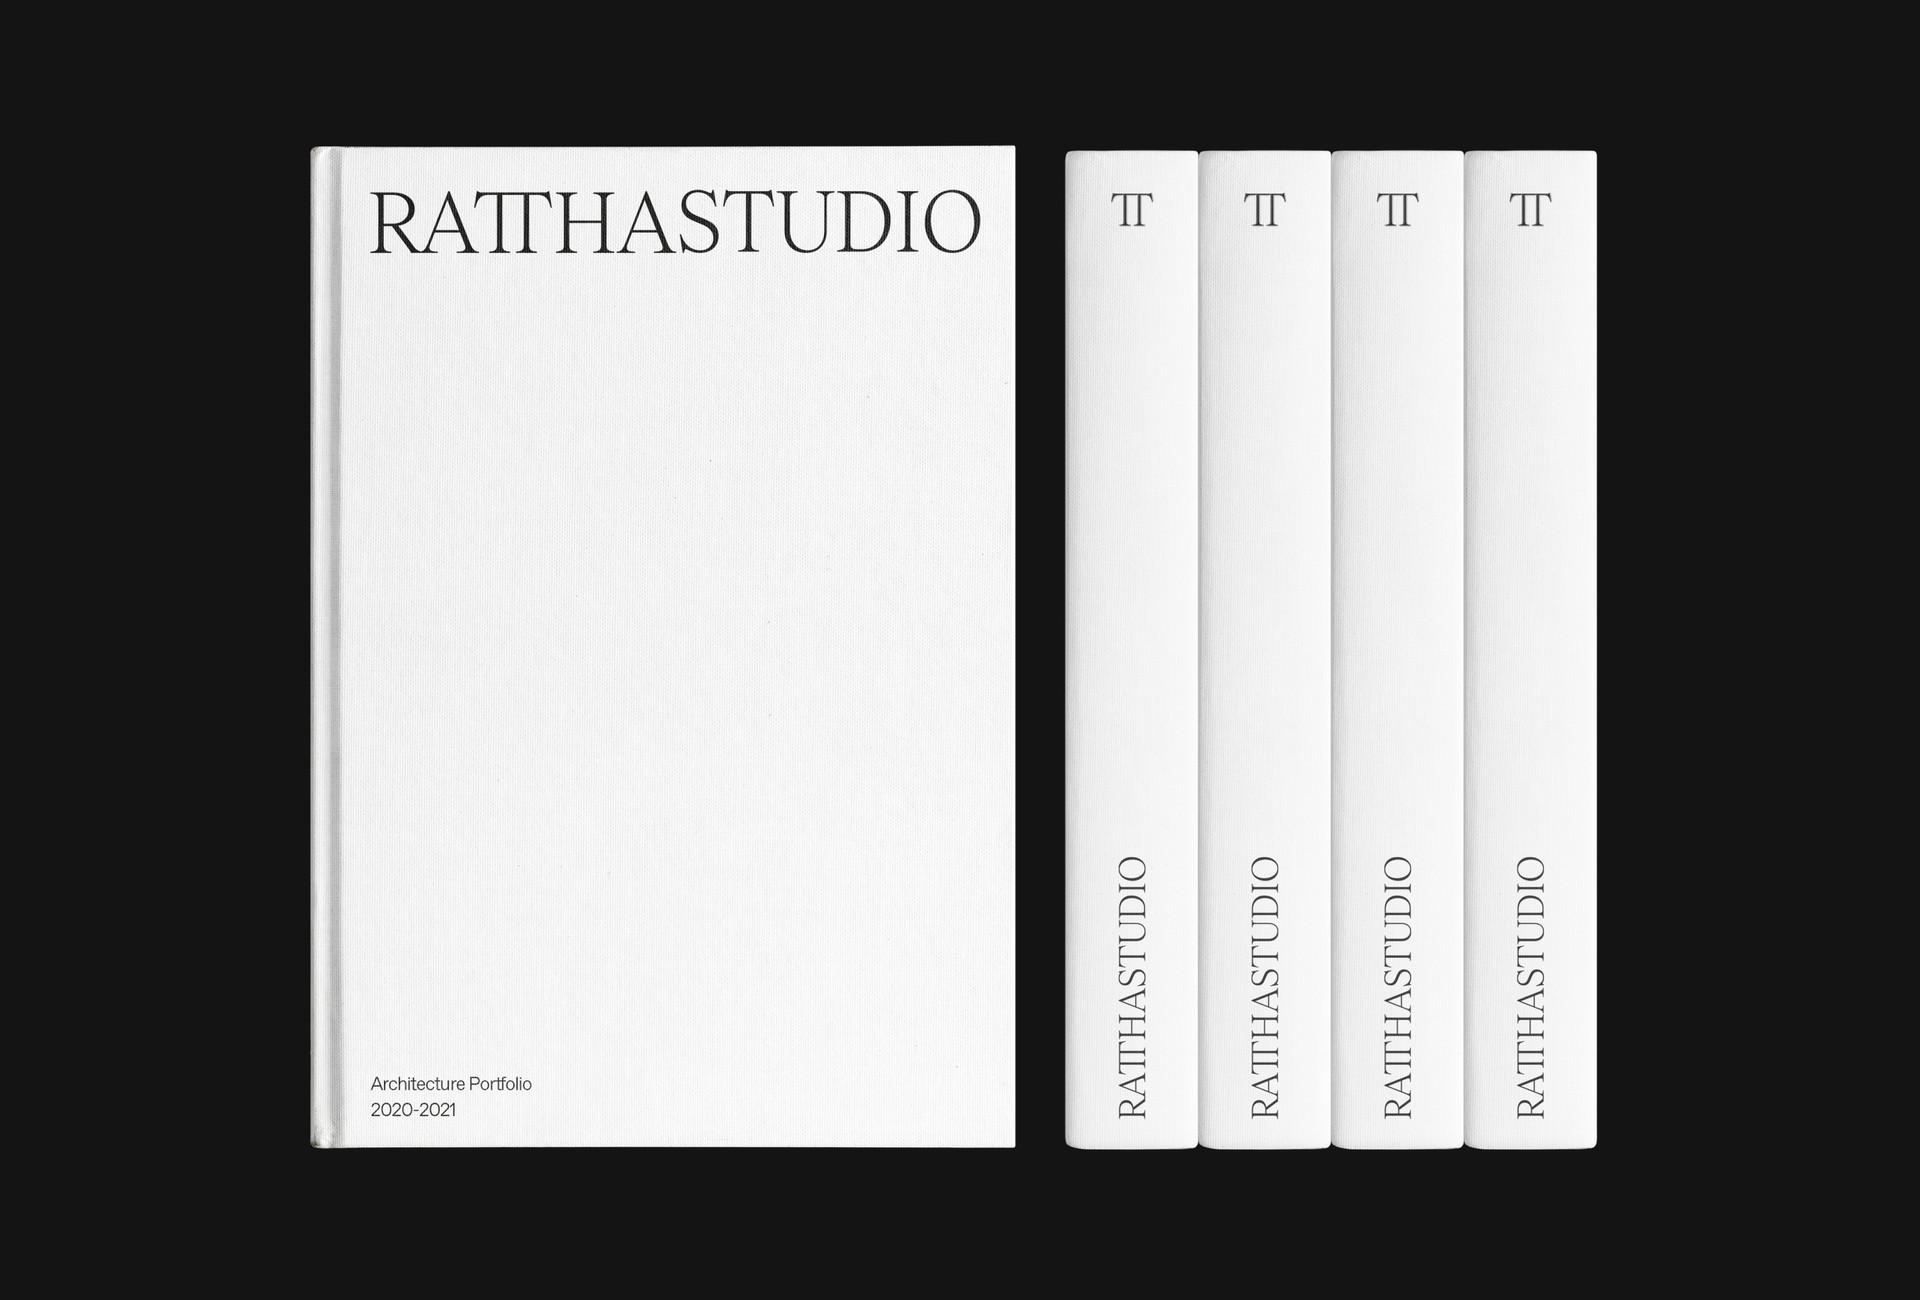 RATTHA_STUDIO